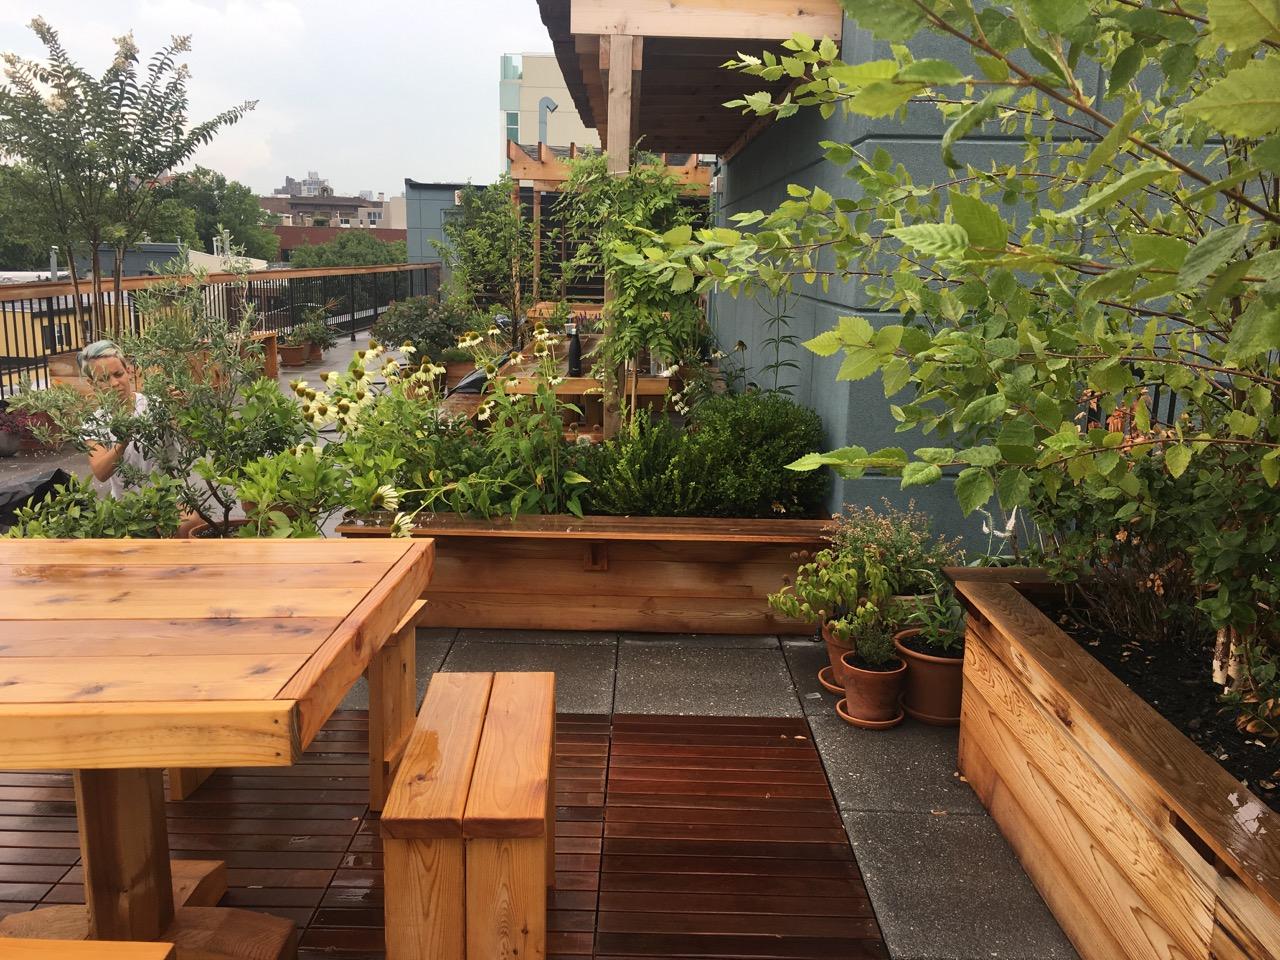 arbor-custom-edibles-rooftop-terrace-garden-by-edible-petals-brooklyn2.jpg